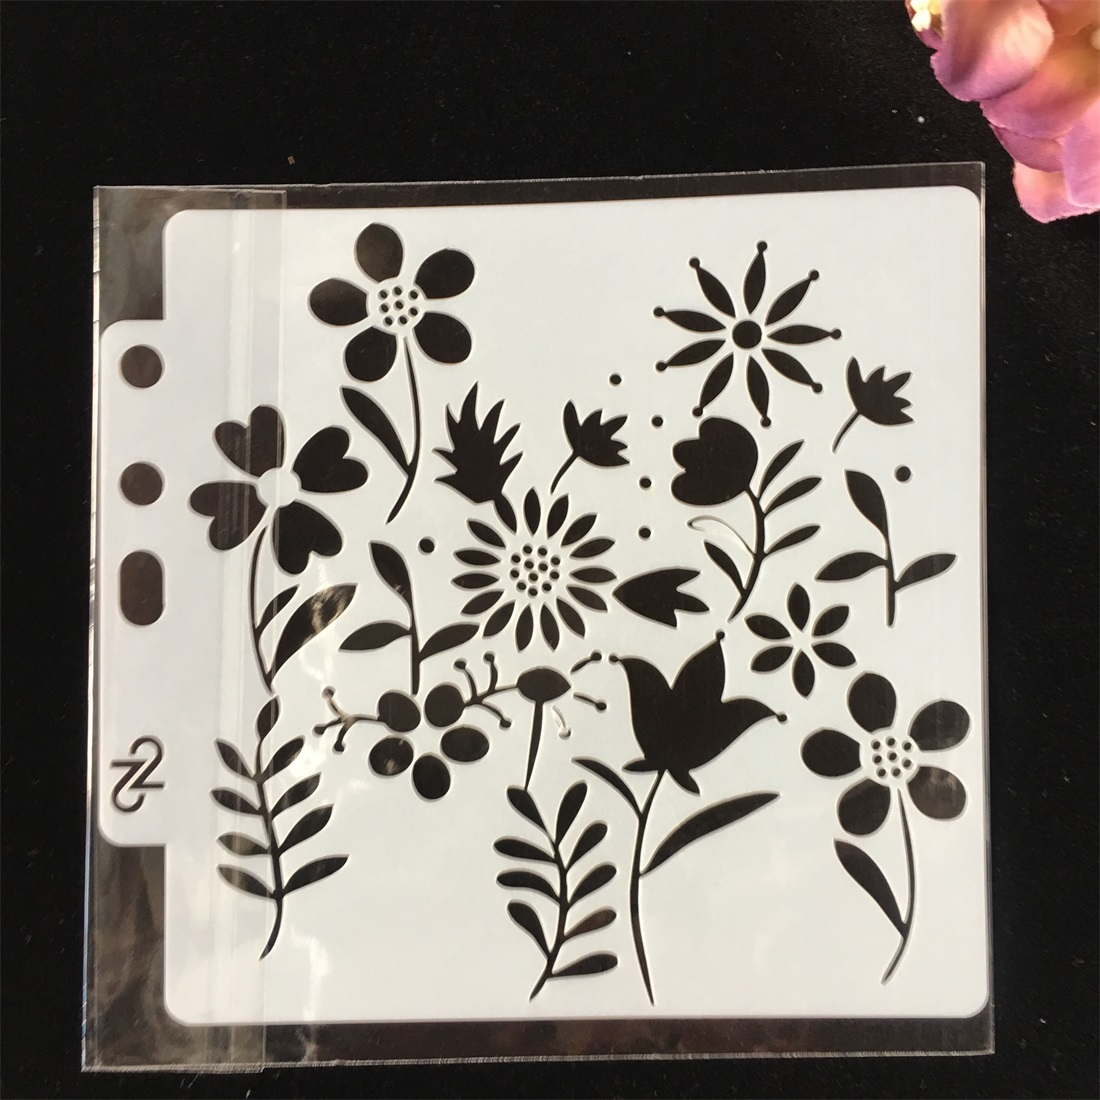 1Pcs Flower Plum DIY Layering Stencils Wall Painting Scrapbook Coloring Embossing Album Decorative Paper Card Template